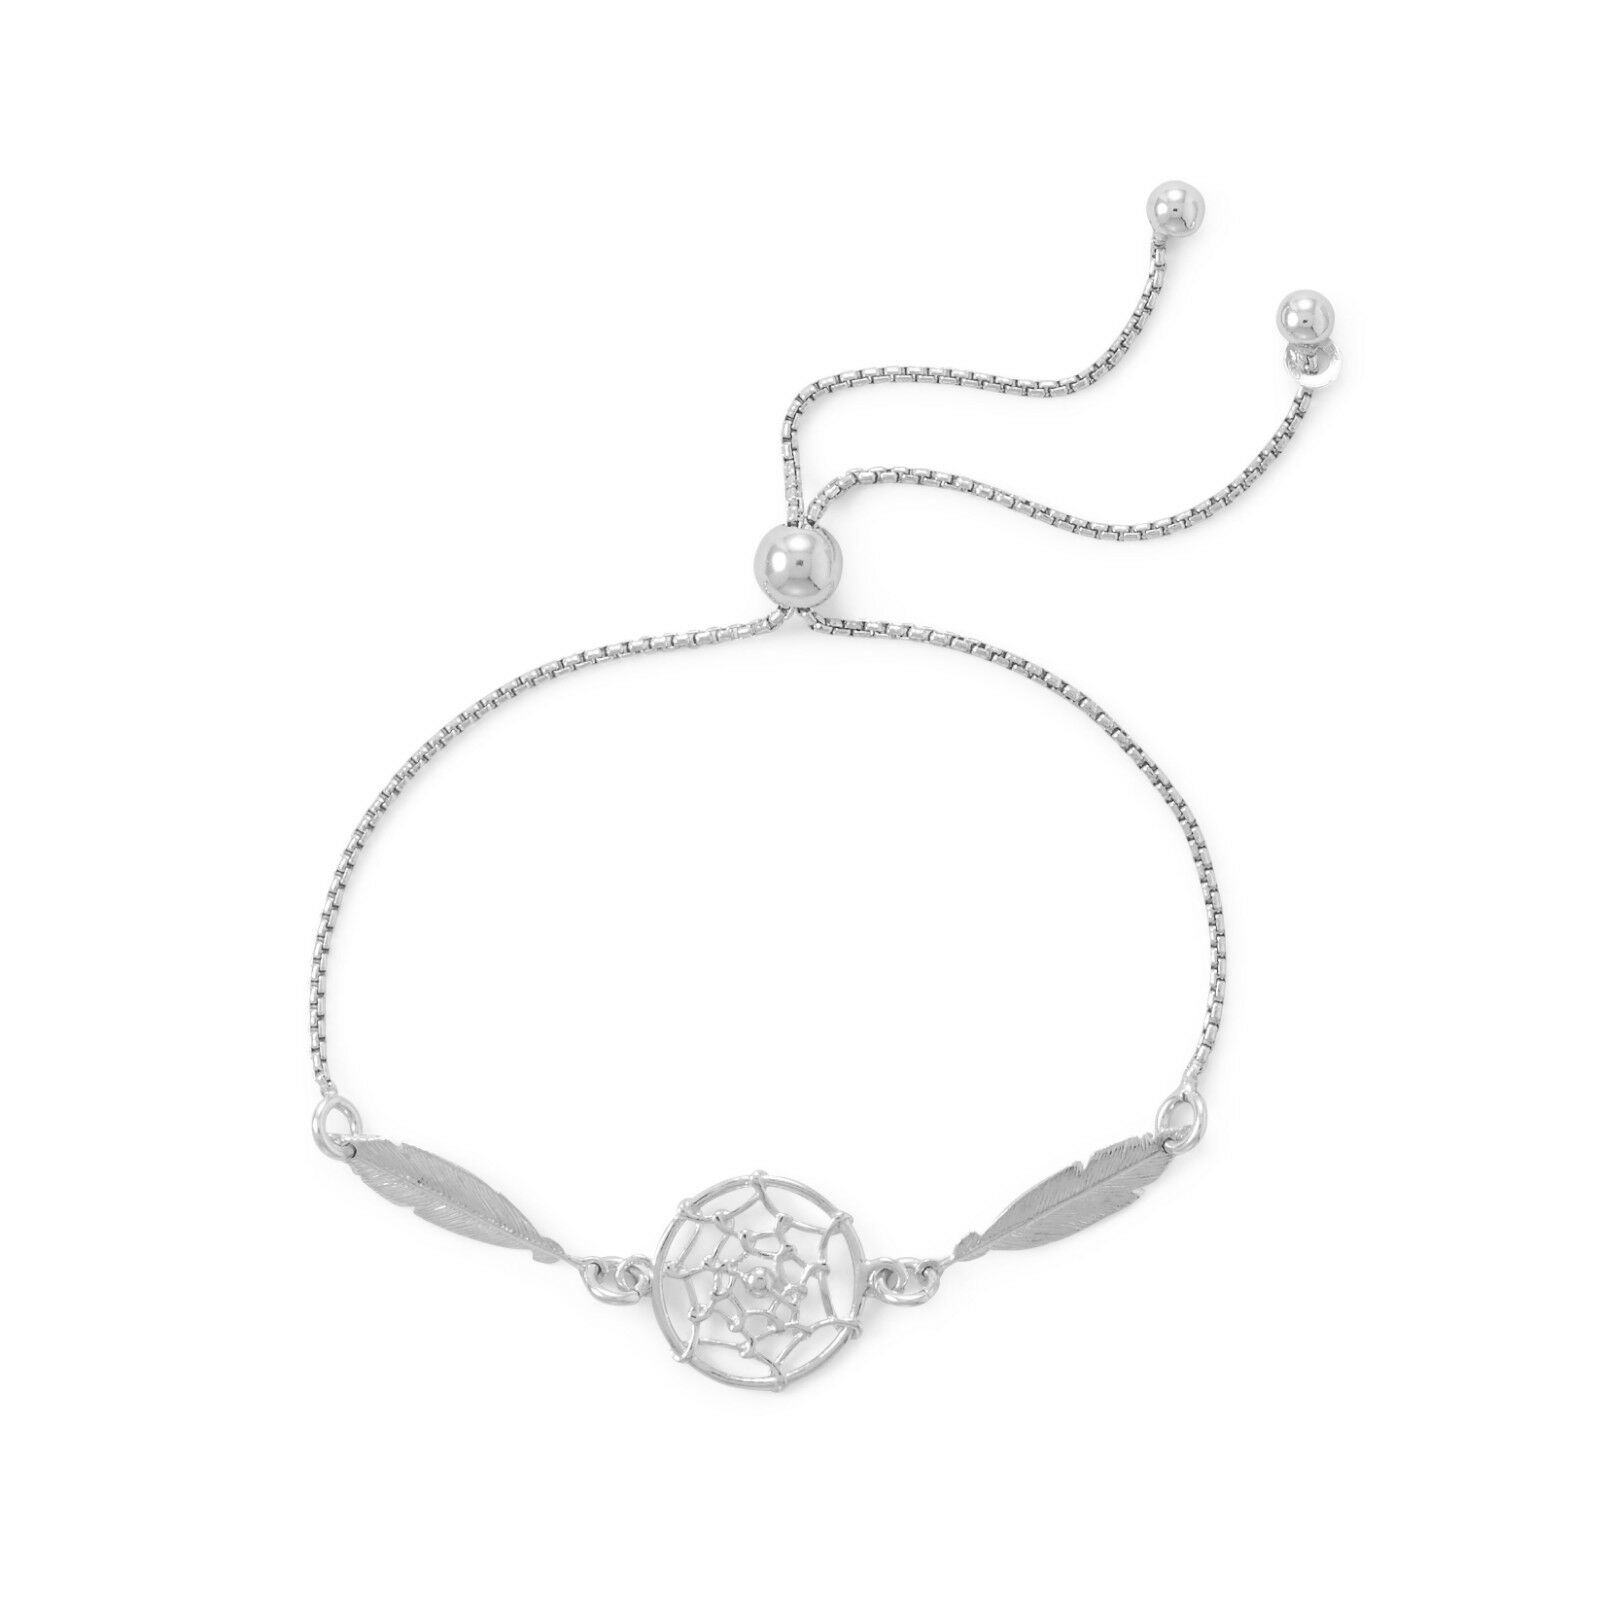 Rhodium Plated Dream Catcher Bolo Bracelet